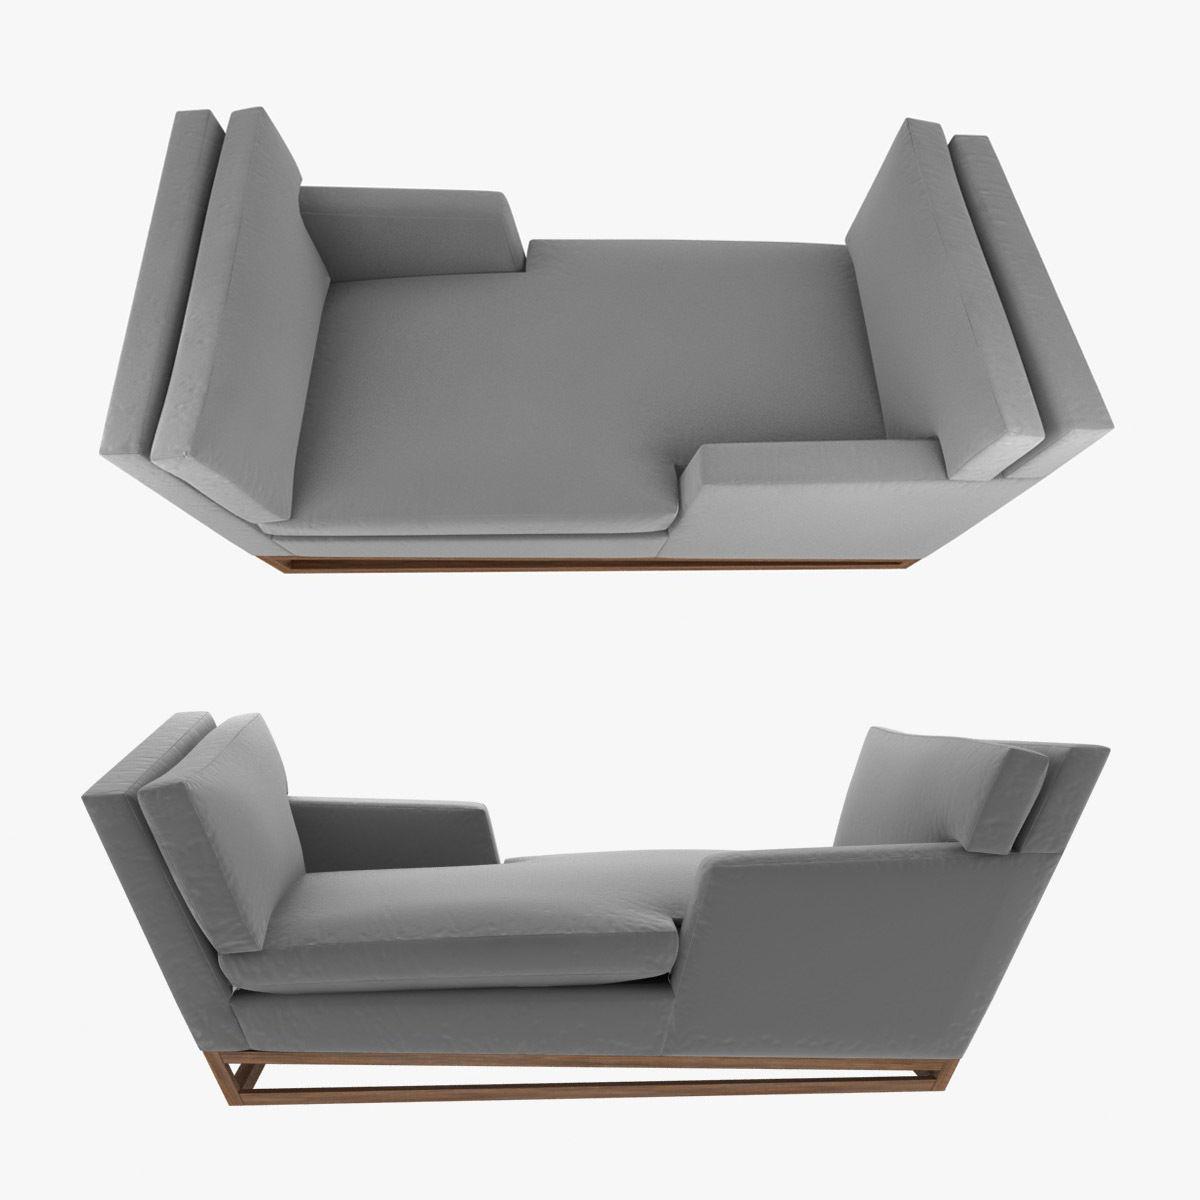 New Contemporary Modern Handmade Tete-a-tete Sofa